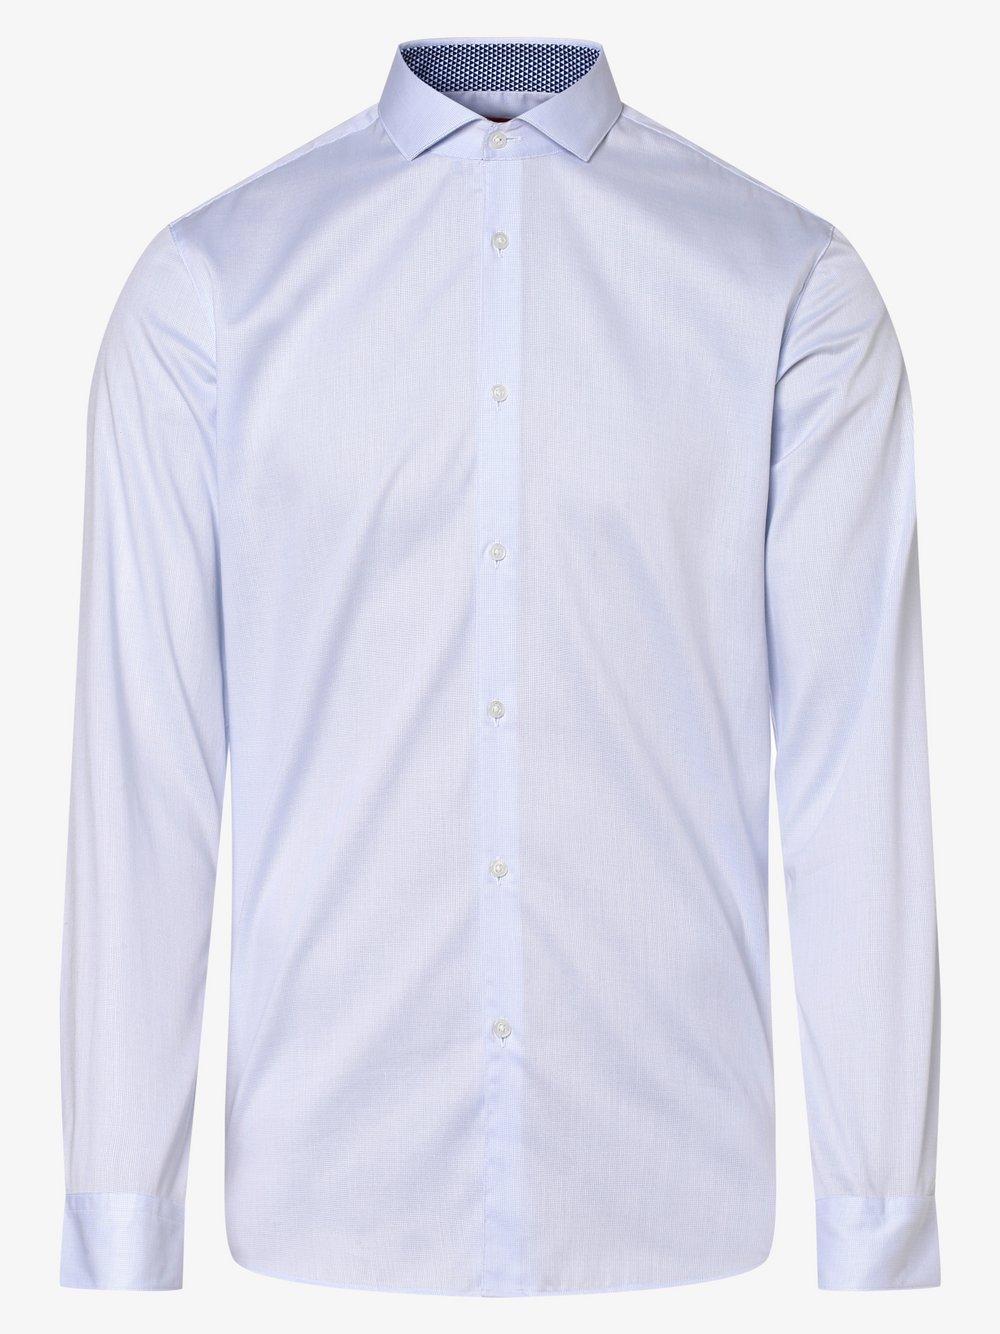 HUGO - Koszula męska łatwa w prasowaniu – Errik, niebieski